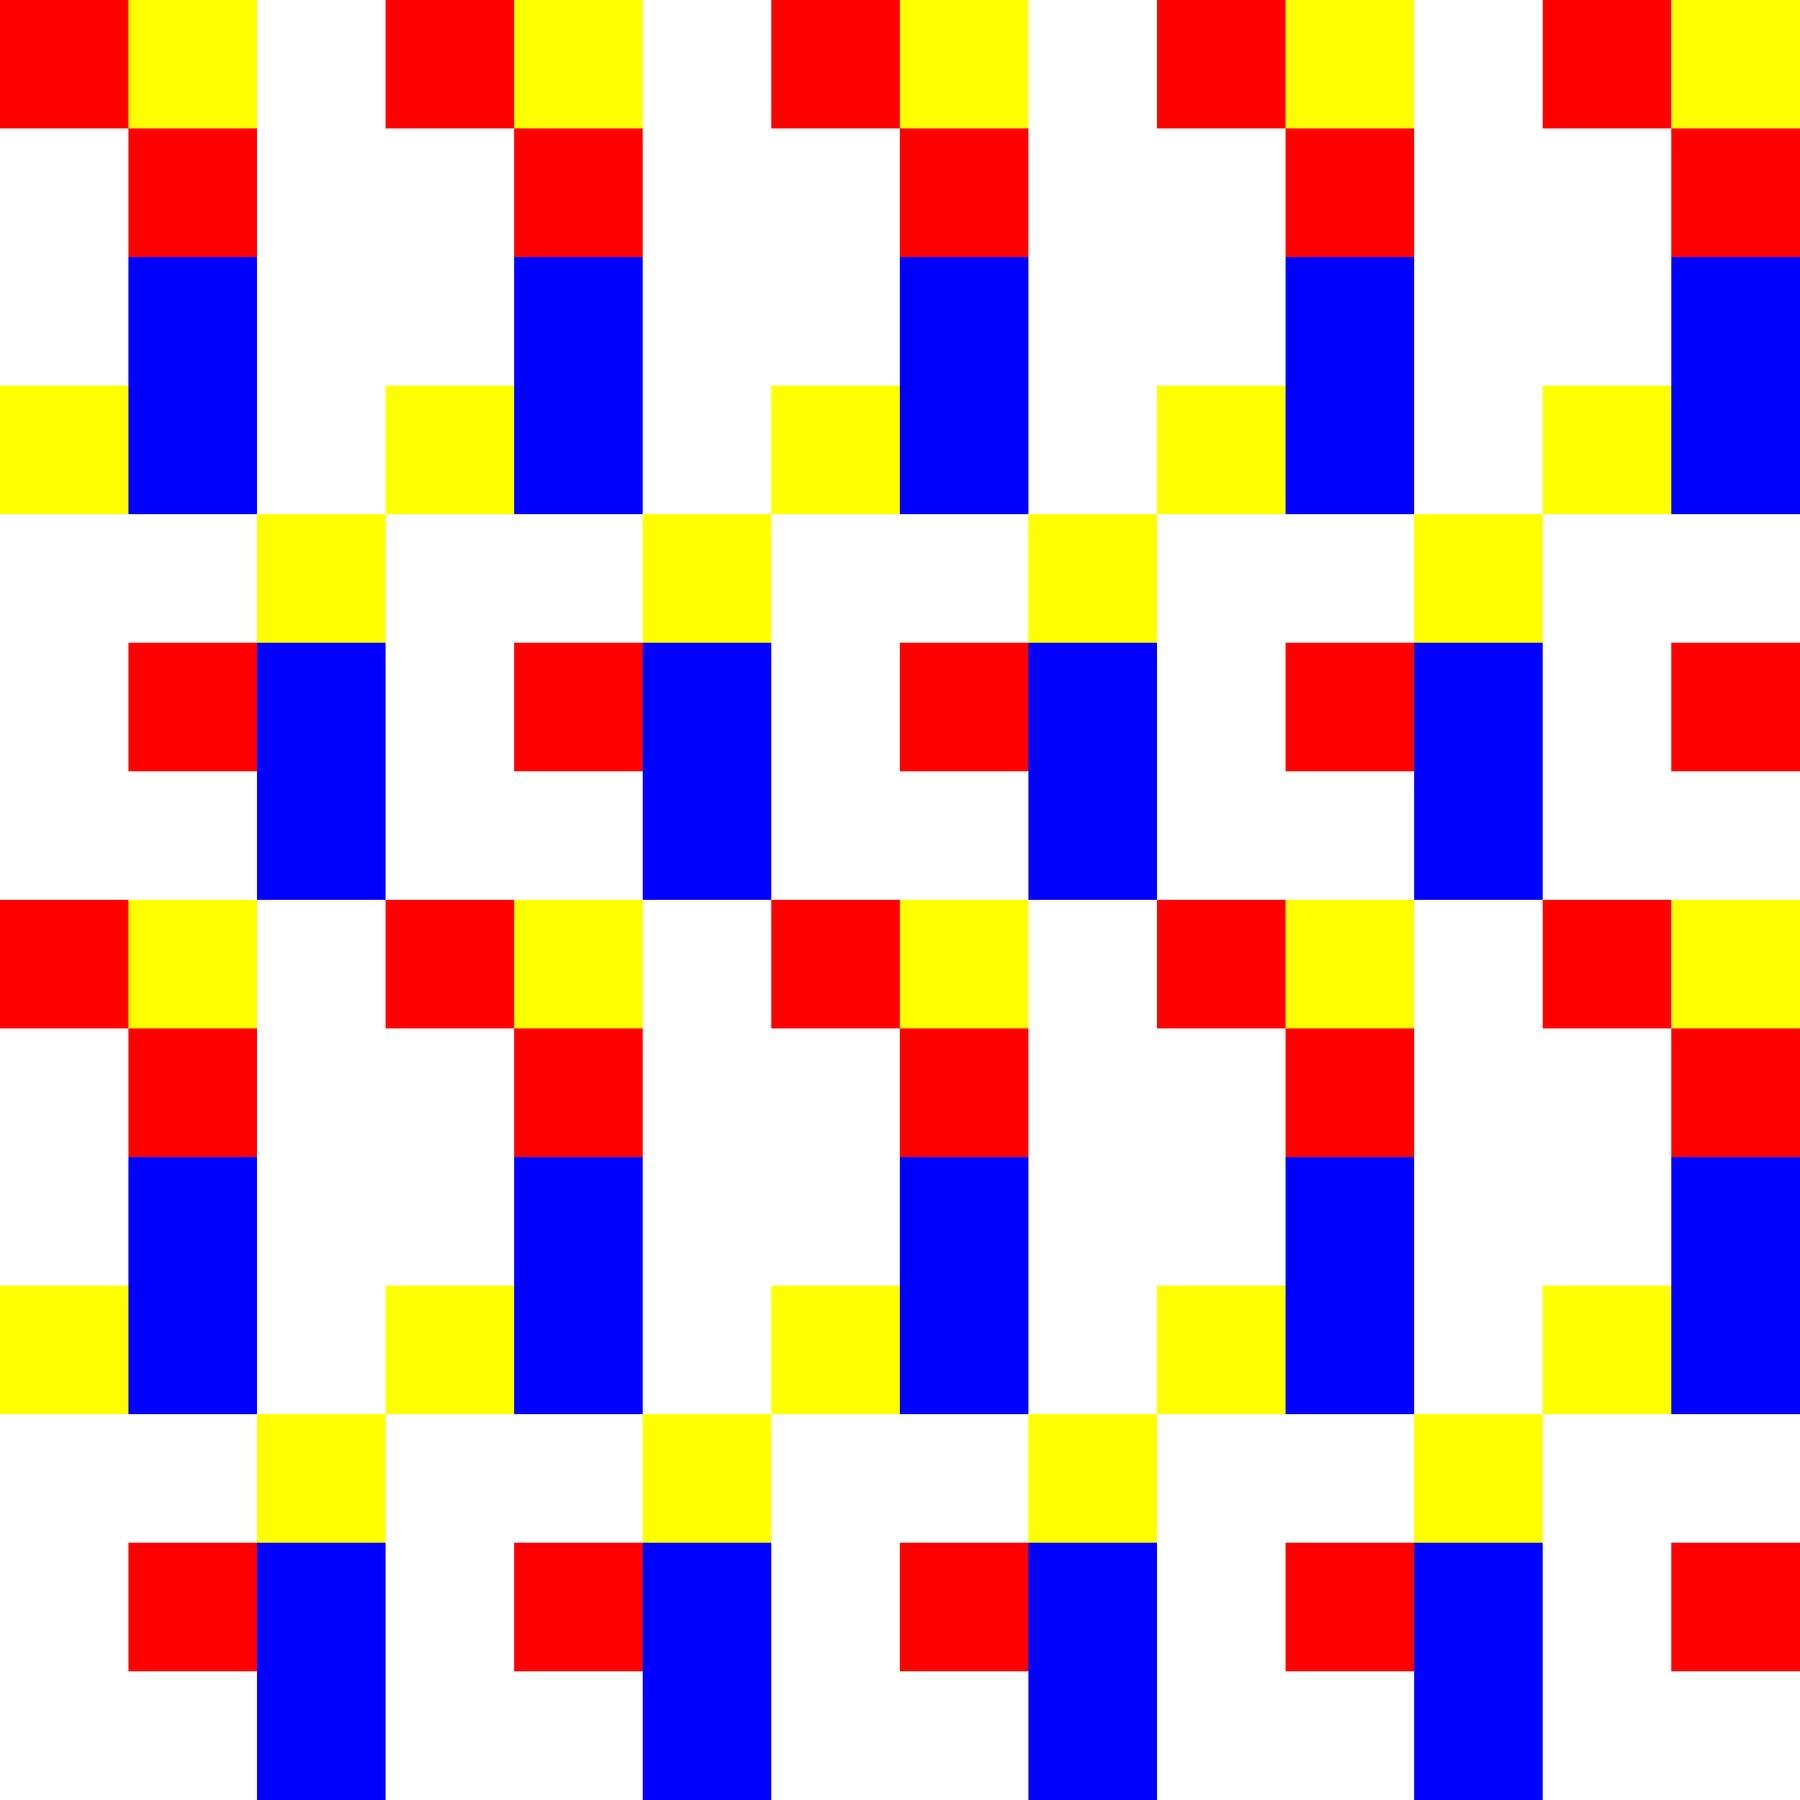 pixel_rug_12_19_20.png